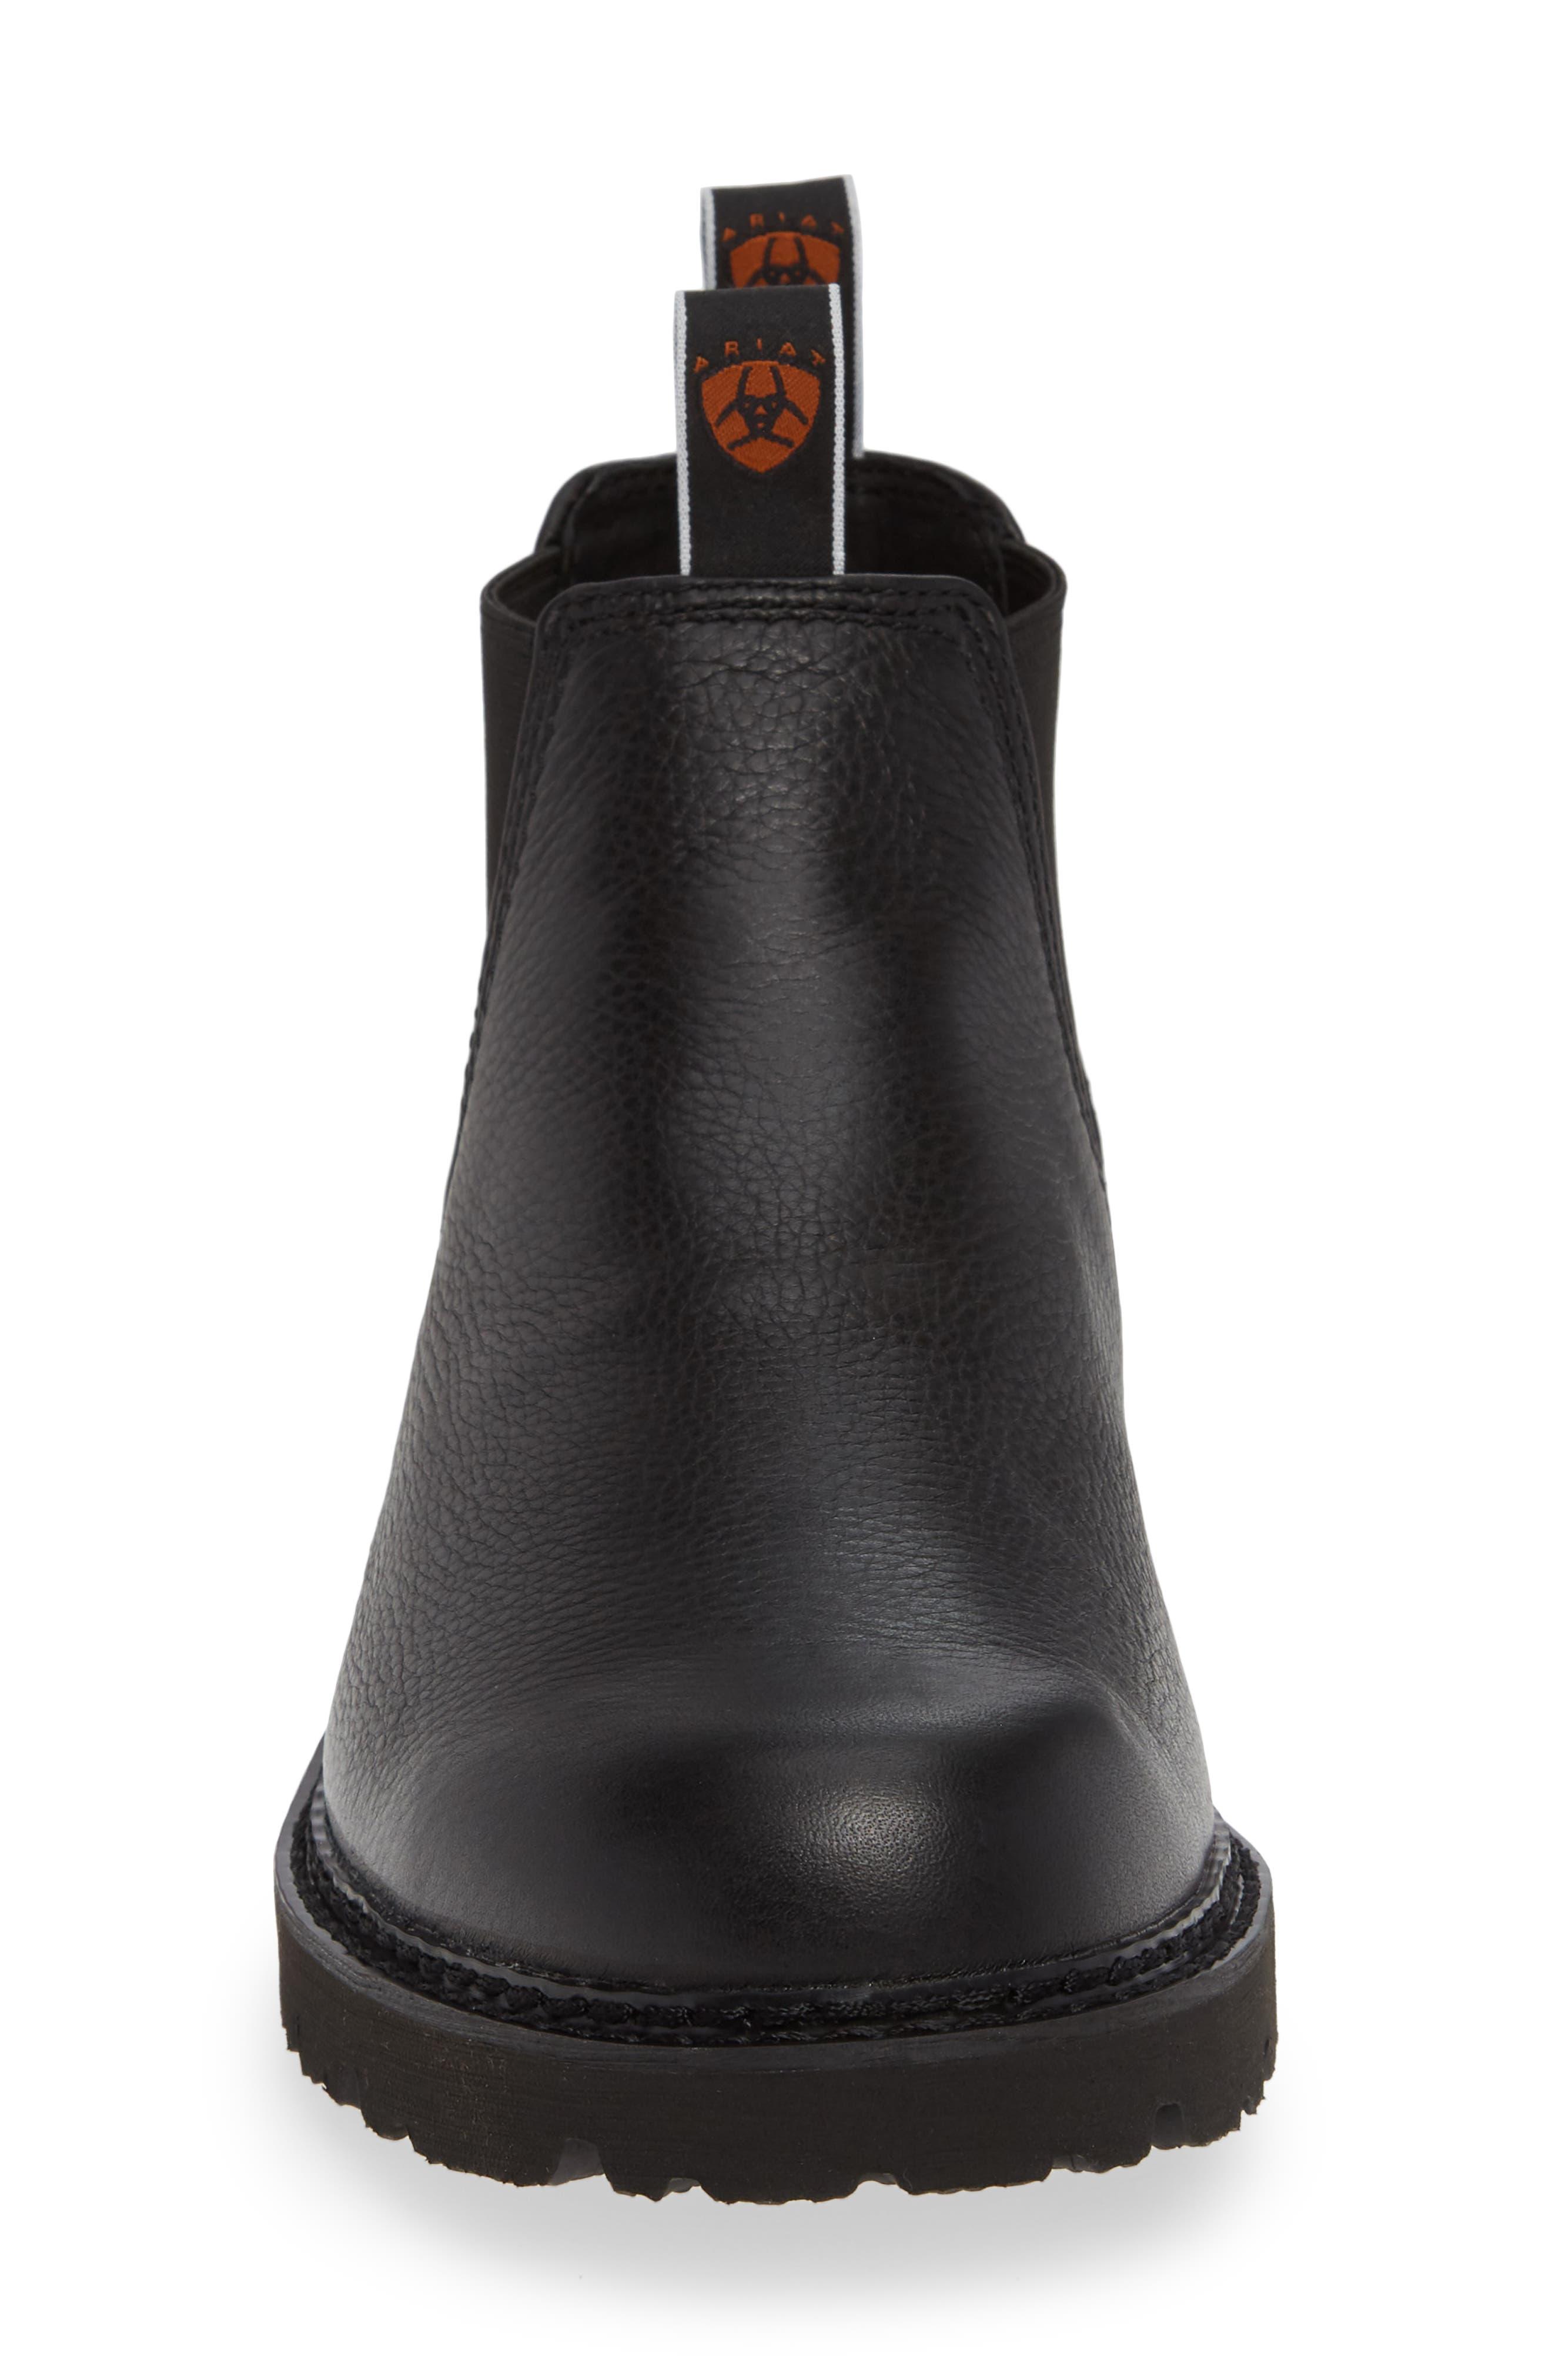 Spothog Chelsea Boot,                             Alternate thumbnail 4, color,                             BLACK DEER TAN LEATHER